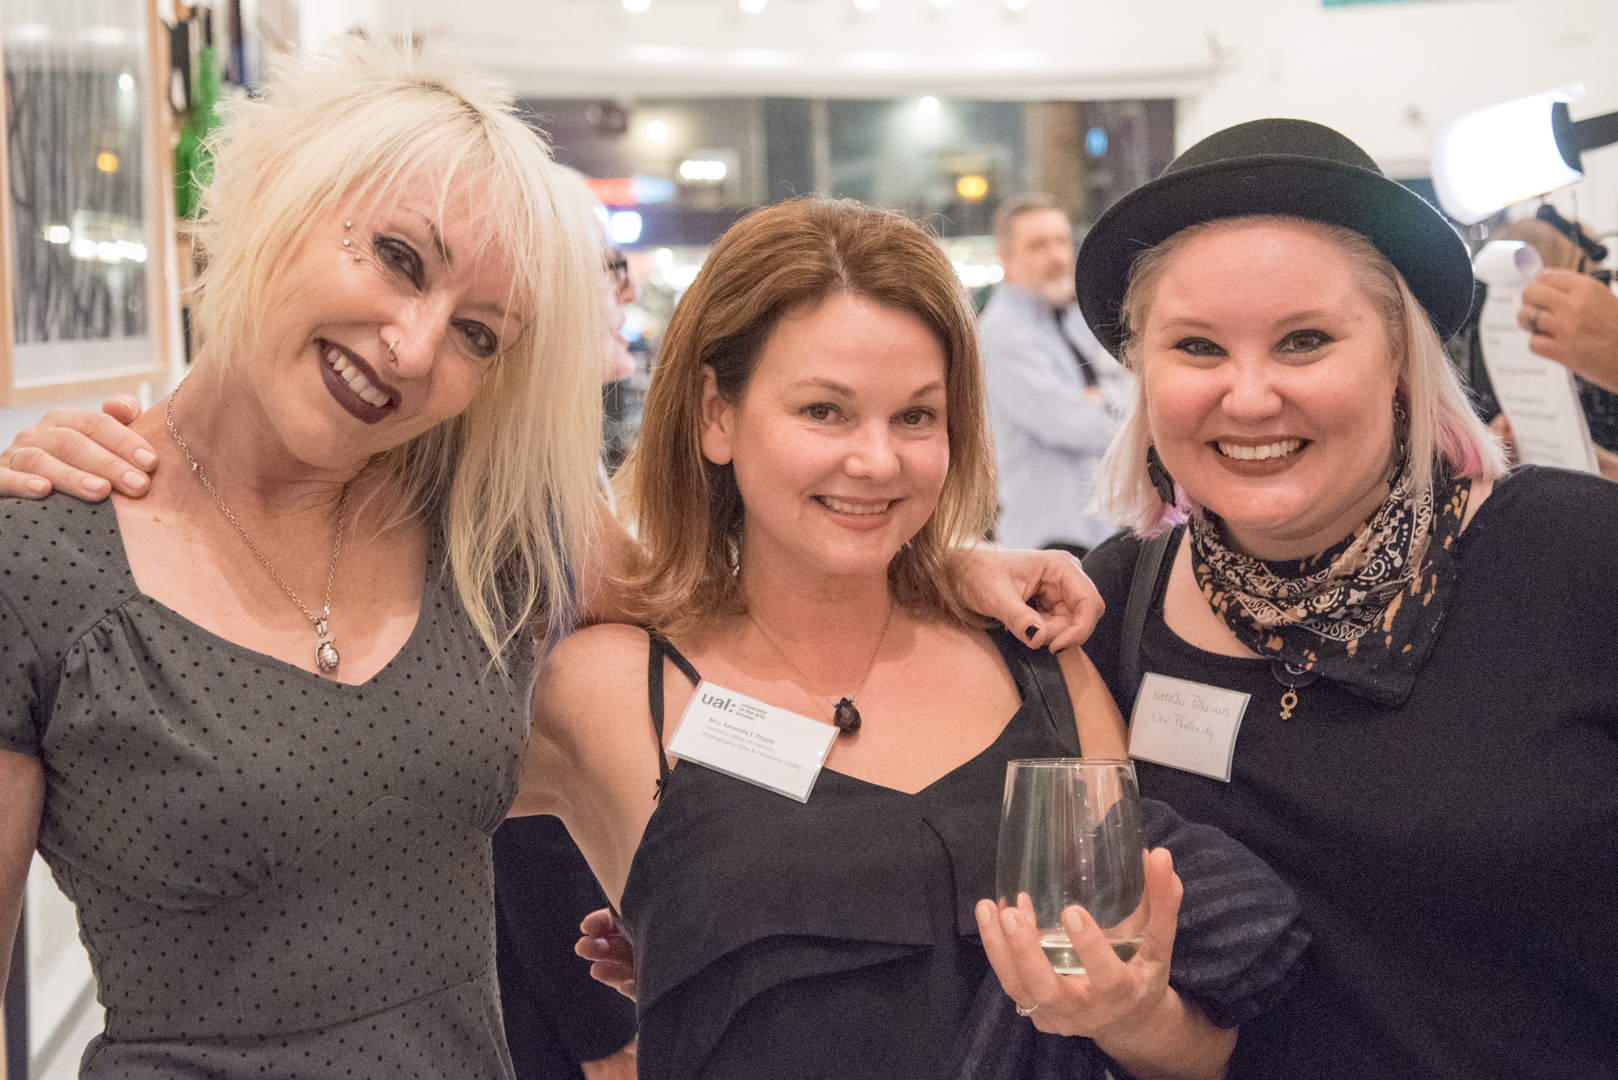 Angie Stimson and fellow LA based alumni